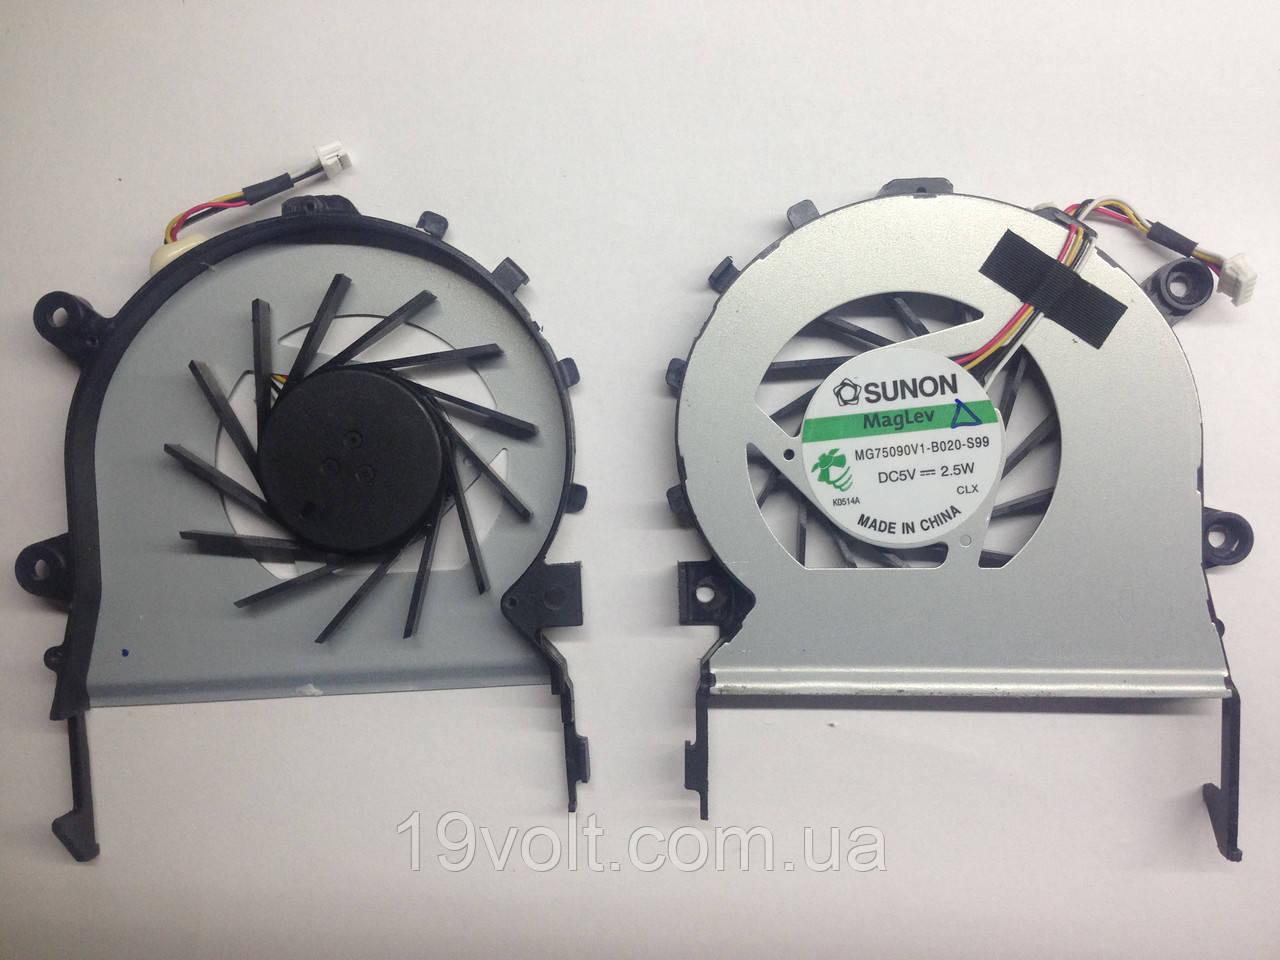 Вентилятор для ноутбука Acer Aspire 5625 (версия 2, без крышки), 5553G, 5553NWXMi